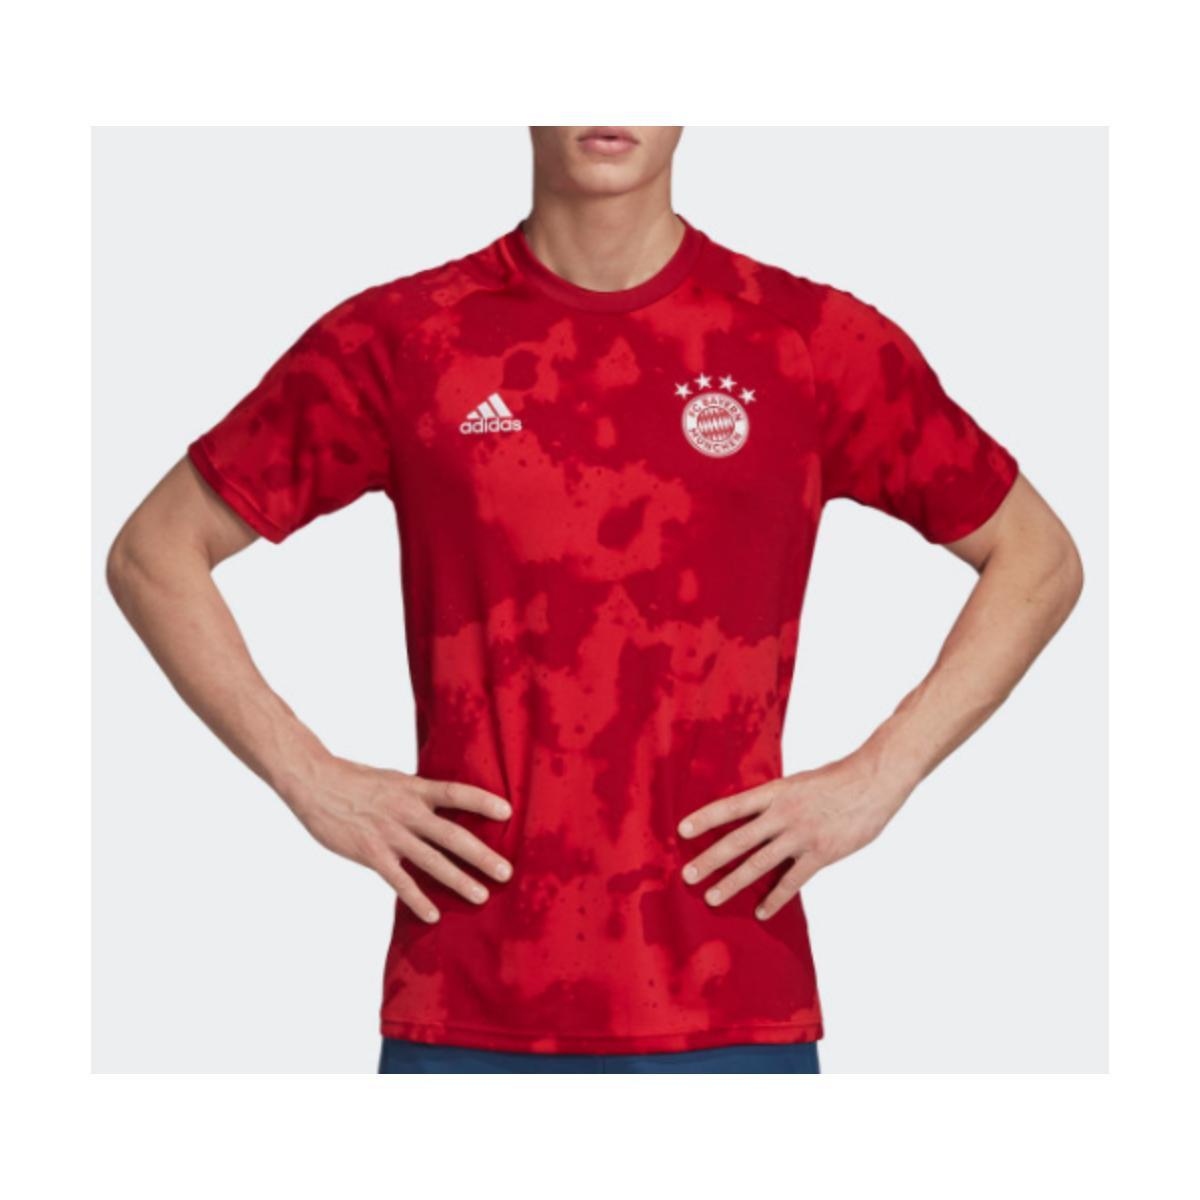 Camiseta Masculina Adidas Dx9676 Pre Jogo Bayern i Vermelho